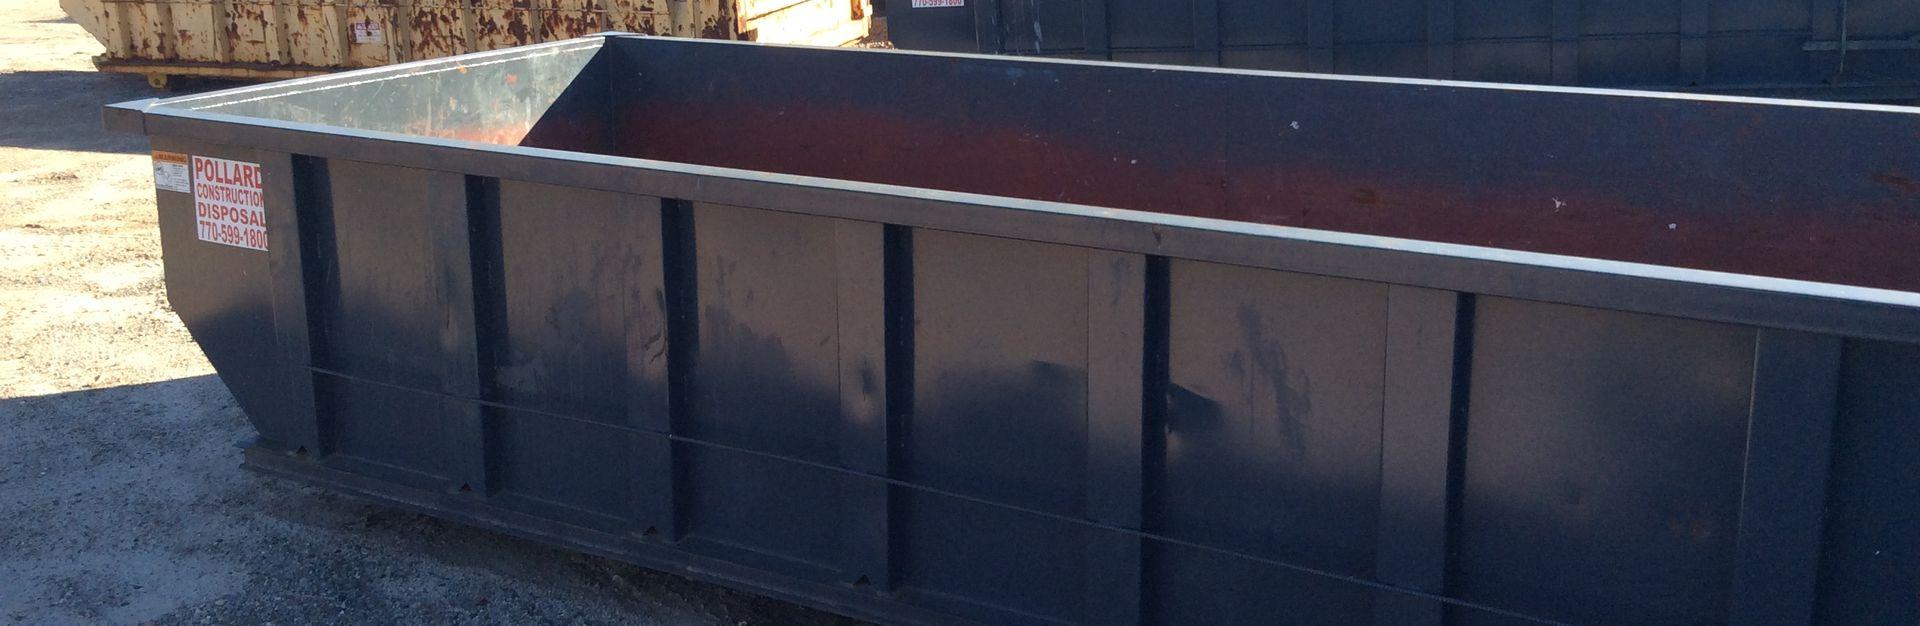 Pollard Construction Trash Removal Services Senoia Ga